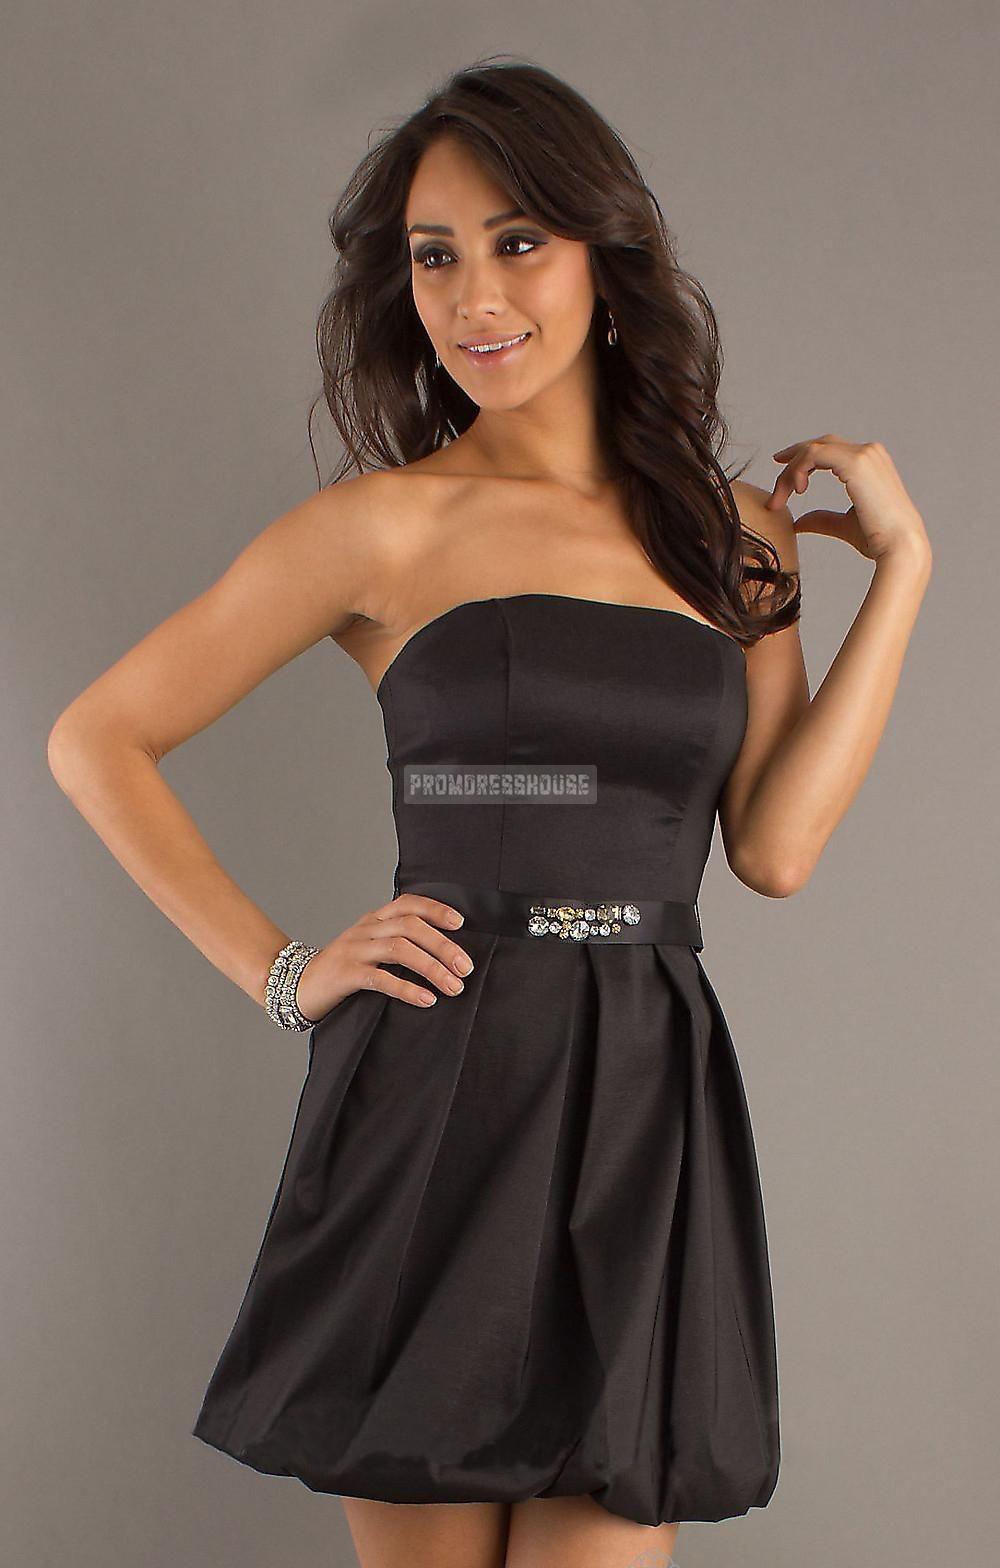 Satin Beading Baby Doll Sash Black Short Length Cocktail Dress - Promdresshouse.com